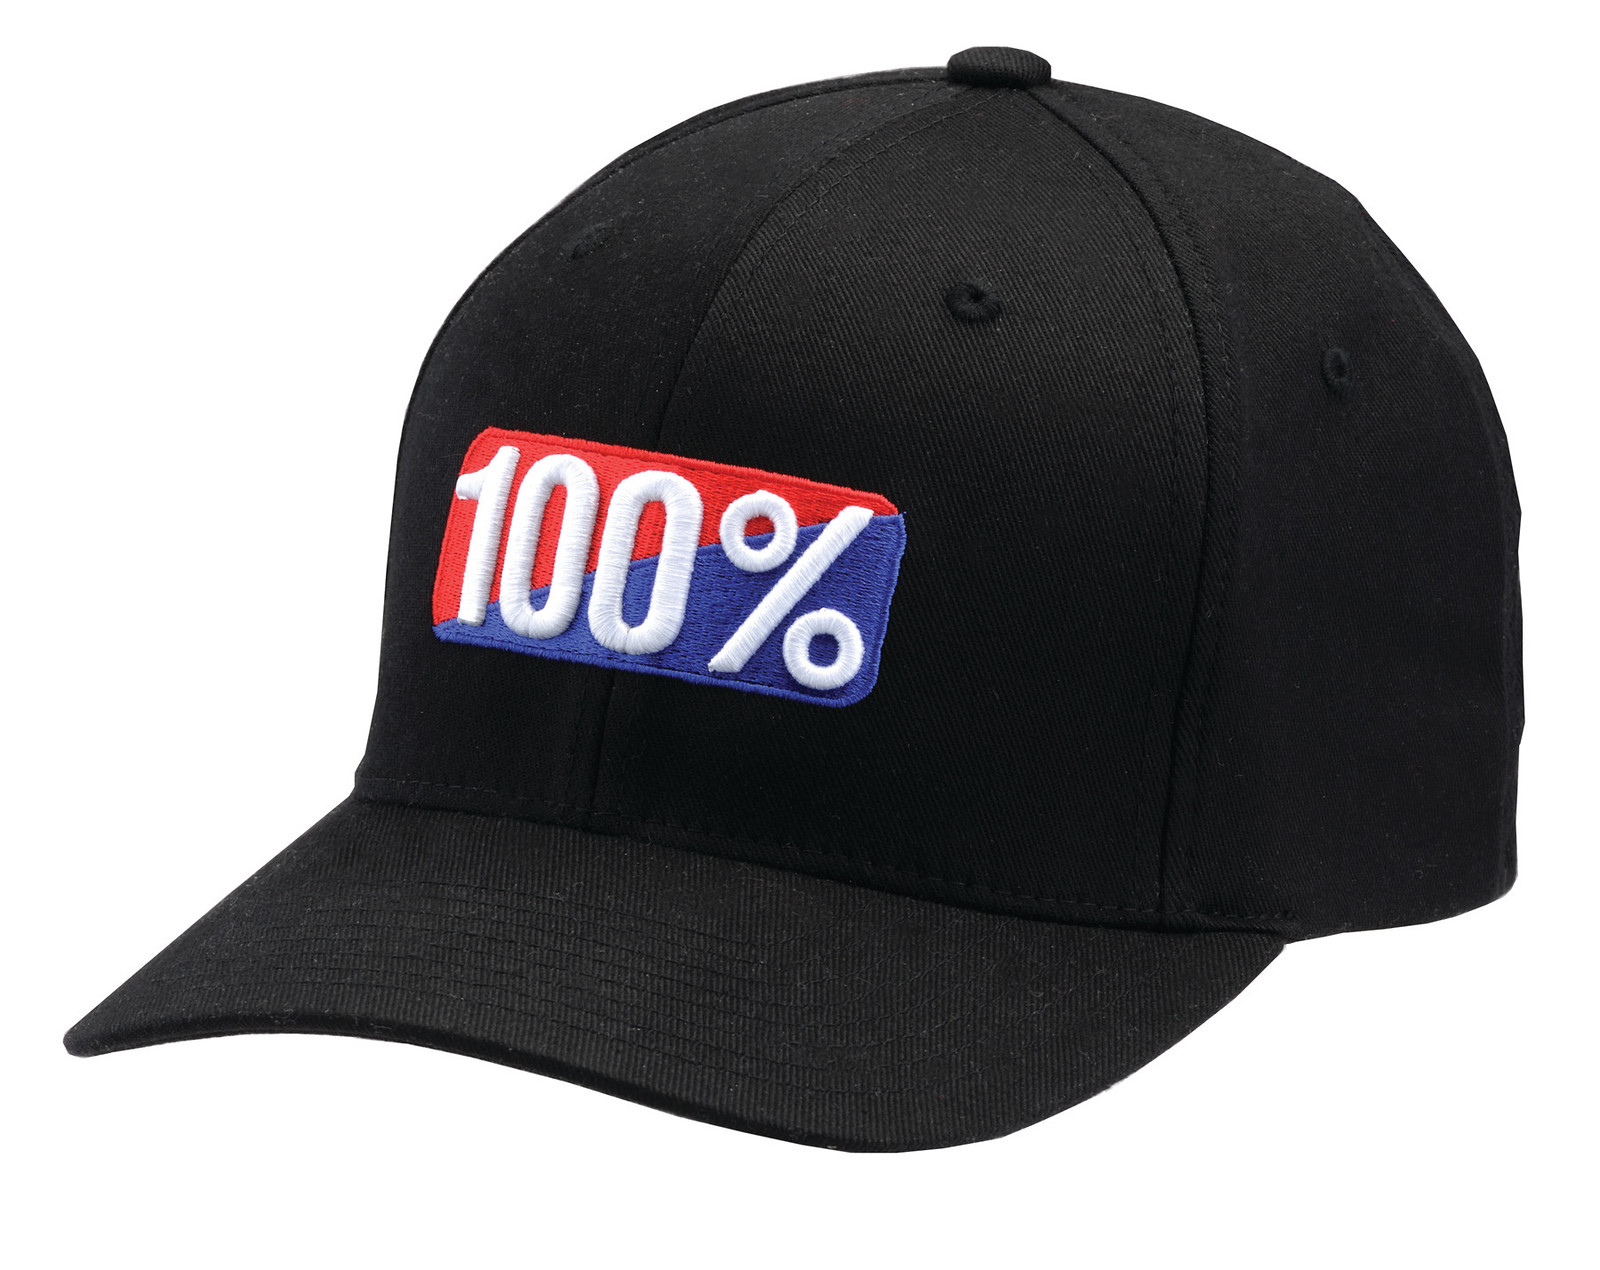 100% OG FlexFit Hat - 100percent - Motocross Pictures - Vital MX